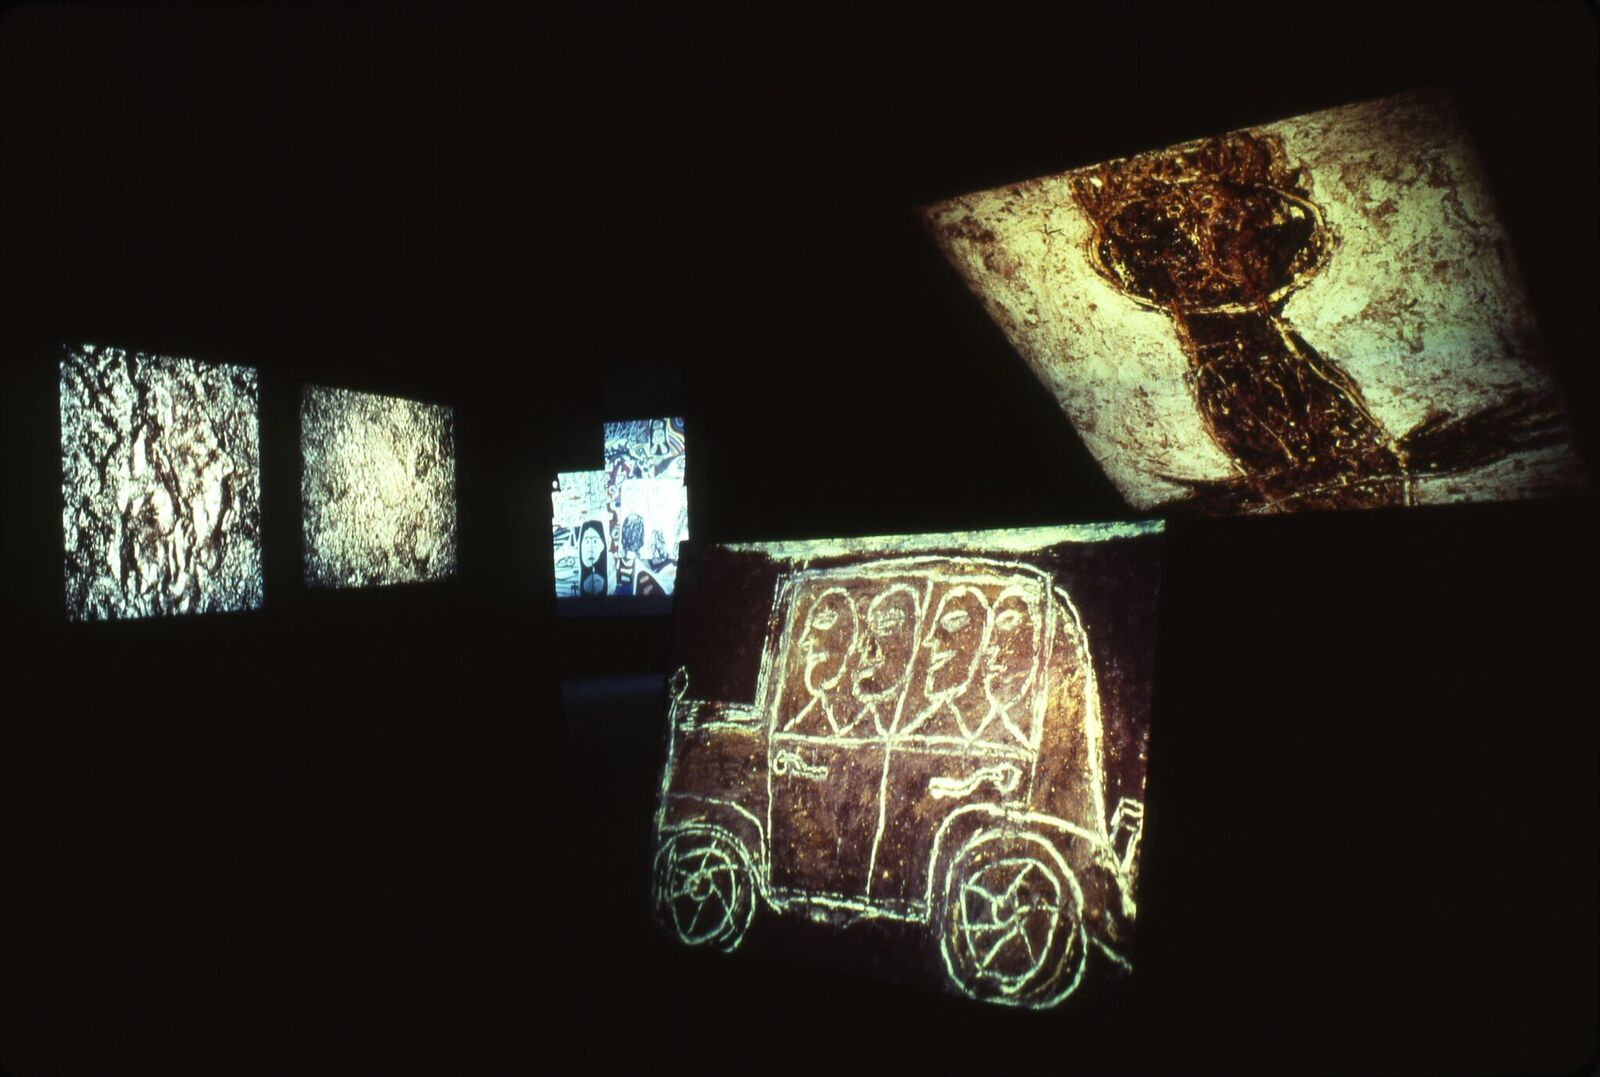 Vue de l'exposition lumineuse de Jean Dubuffet par Fiat, Turin, 1978 © Fondation Dubuffet ProLitteris